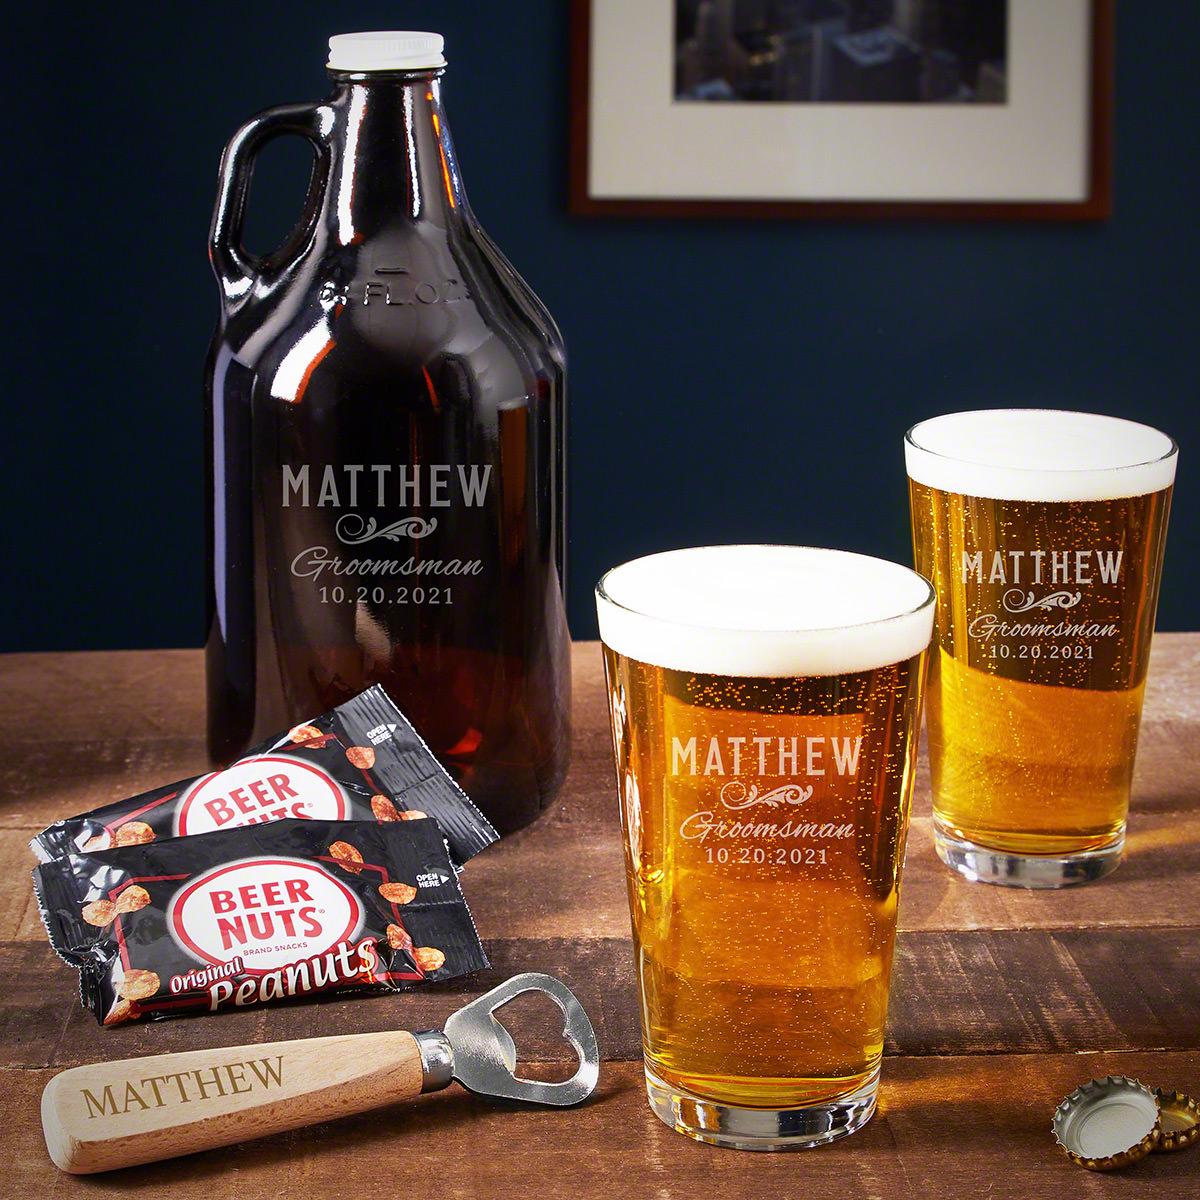 Classic-Groomsman-Custom-Beer-Growler-Groomsman-Gift-Set